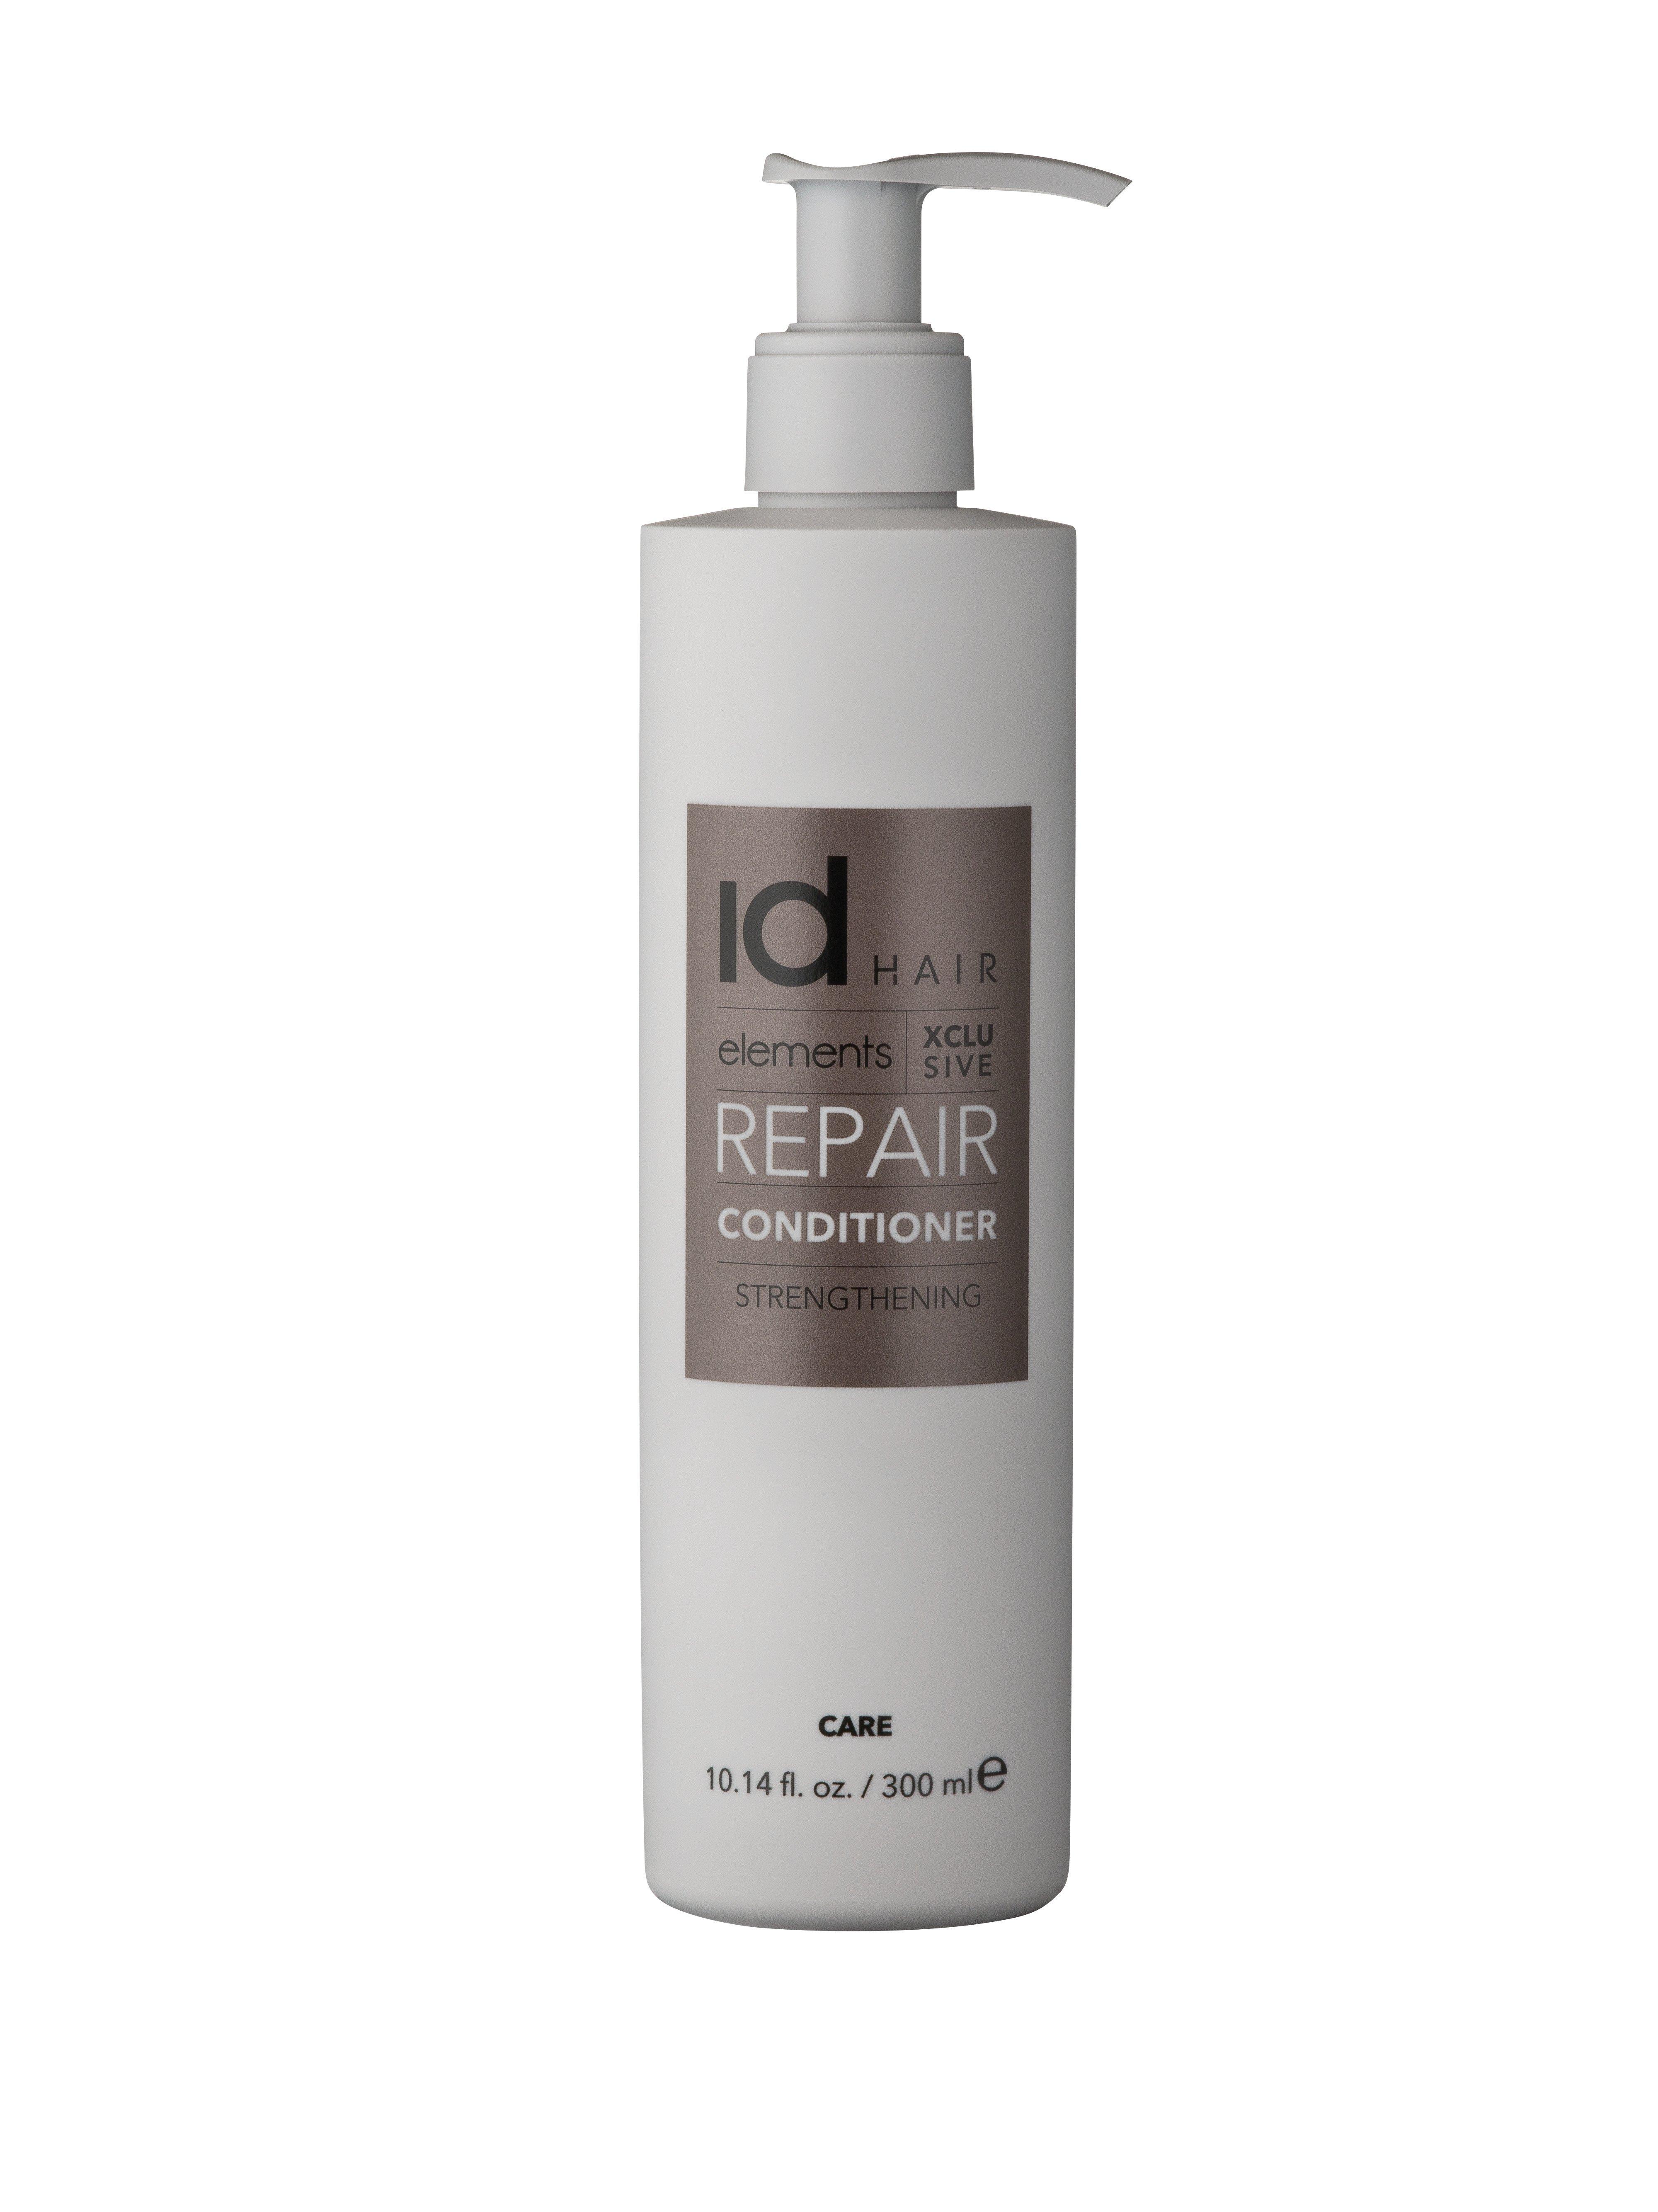 IdHAIR - Elements Xclusive Repair Conditioner 300 ml